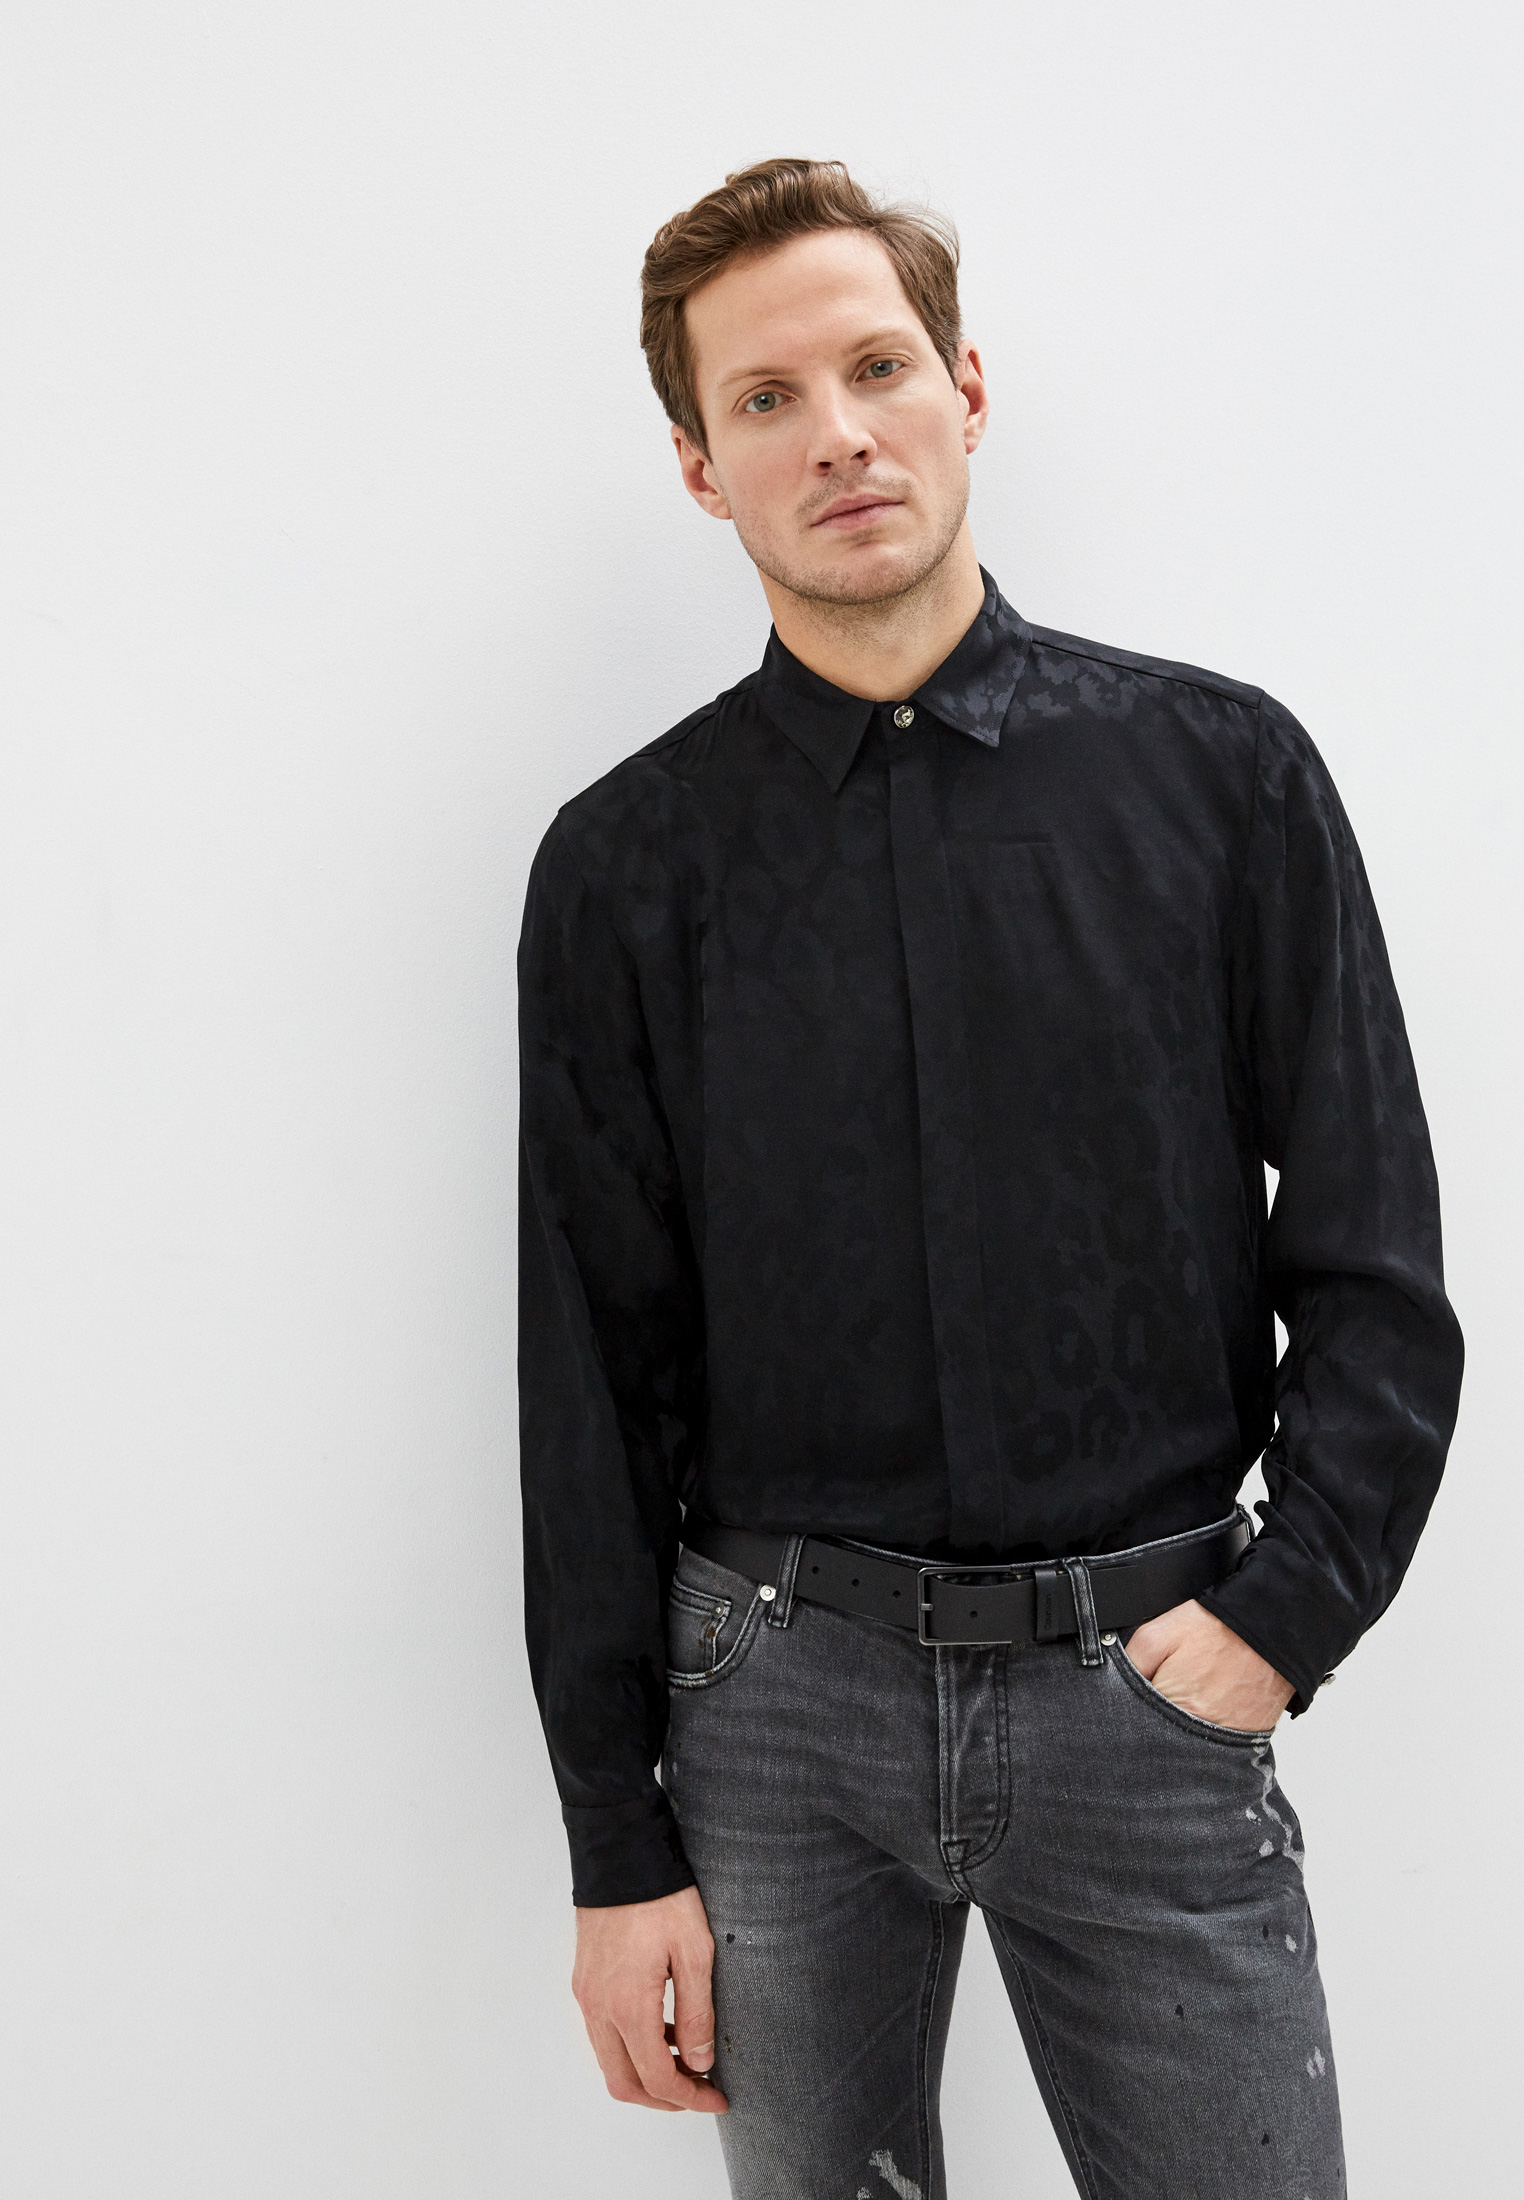 Рубашка с длинным рукавом Just Cavalli (Джаст Кавалли) s01dl0251